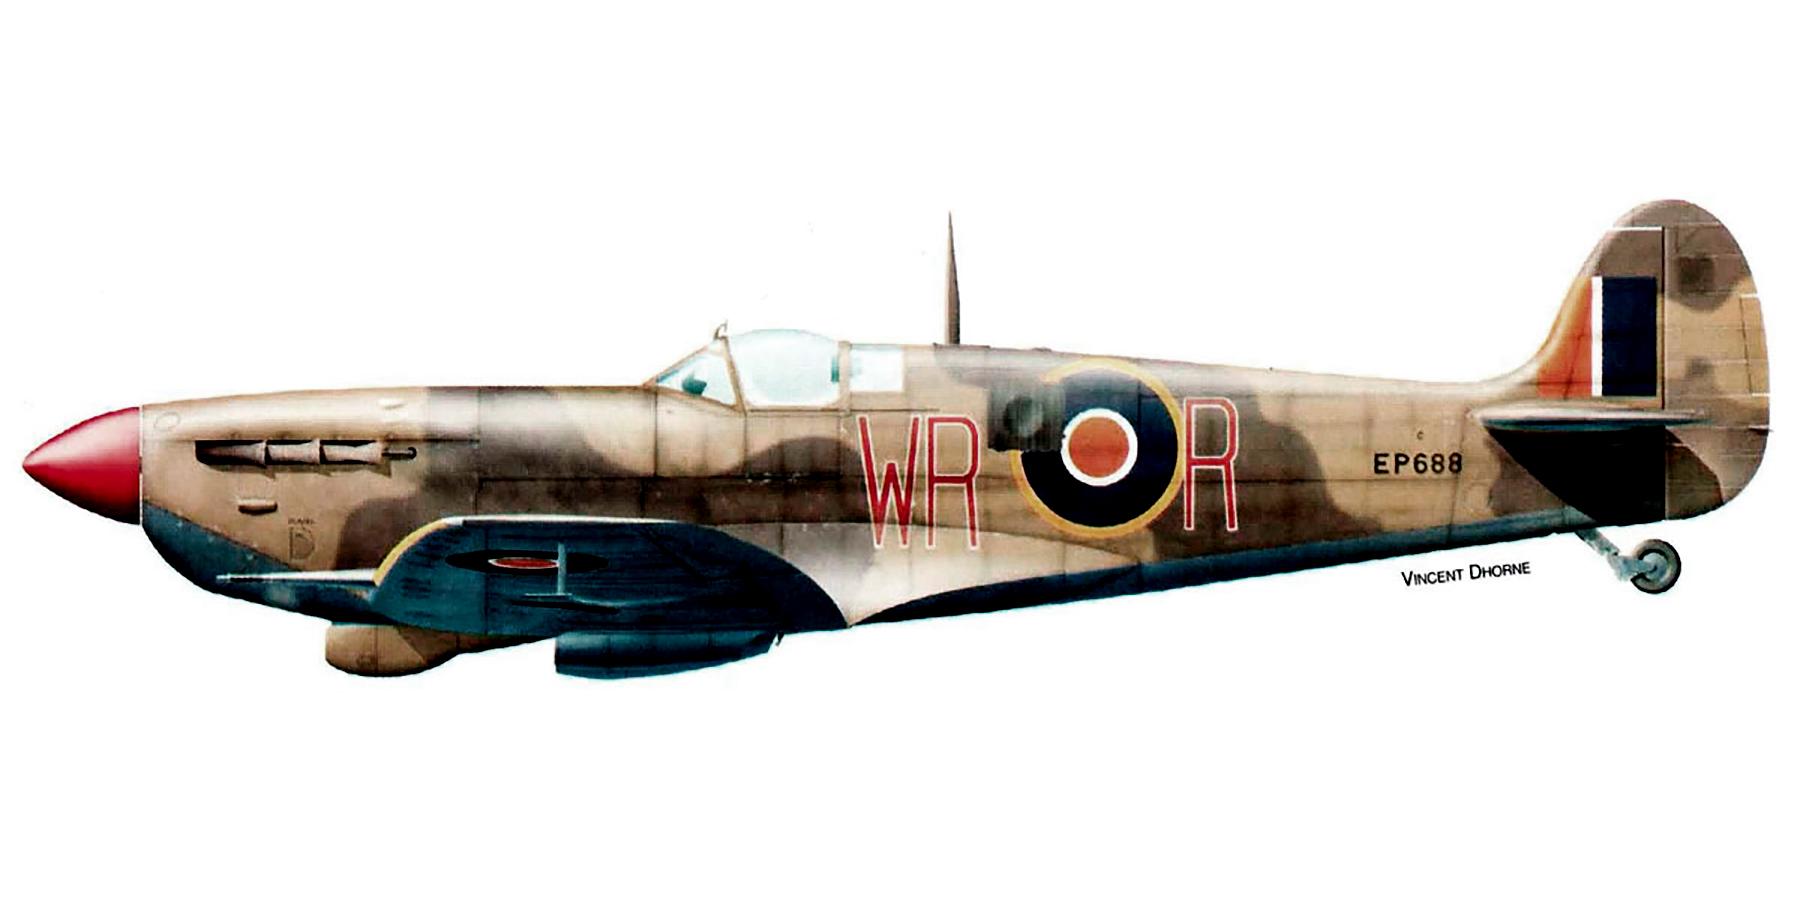 Spitfire LFVb SAAF 40Sqn WRR Aboukir filter F24 camera EP688 Sicily 1943 0A